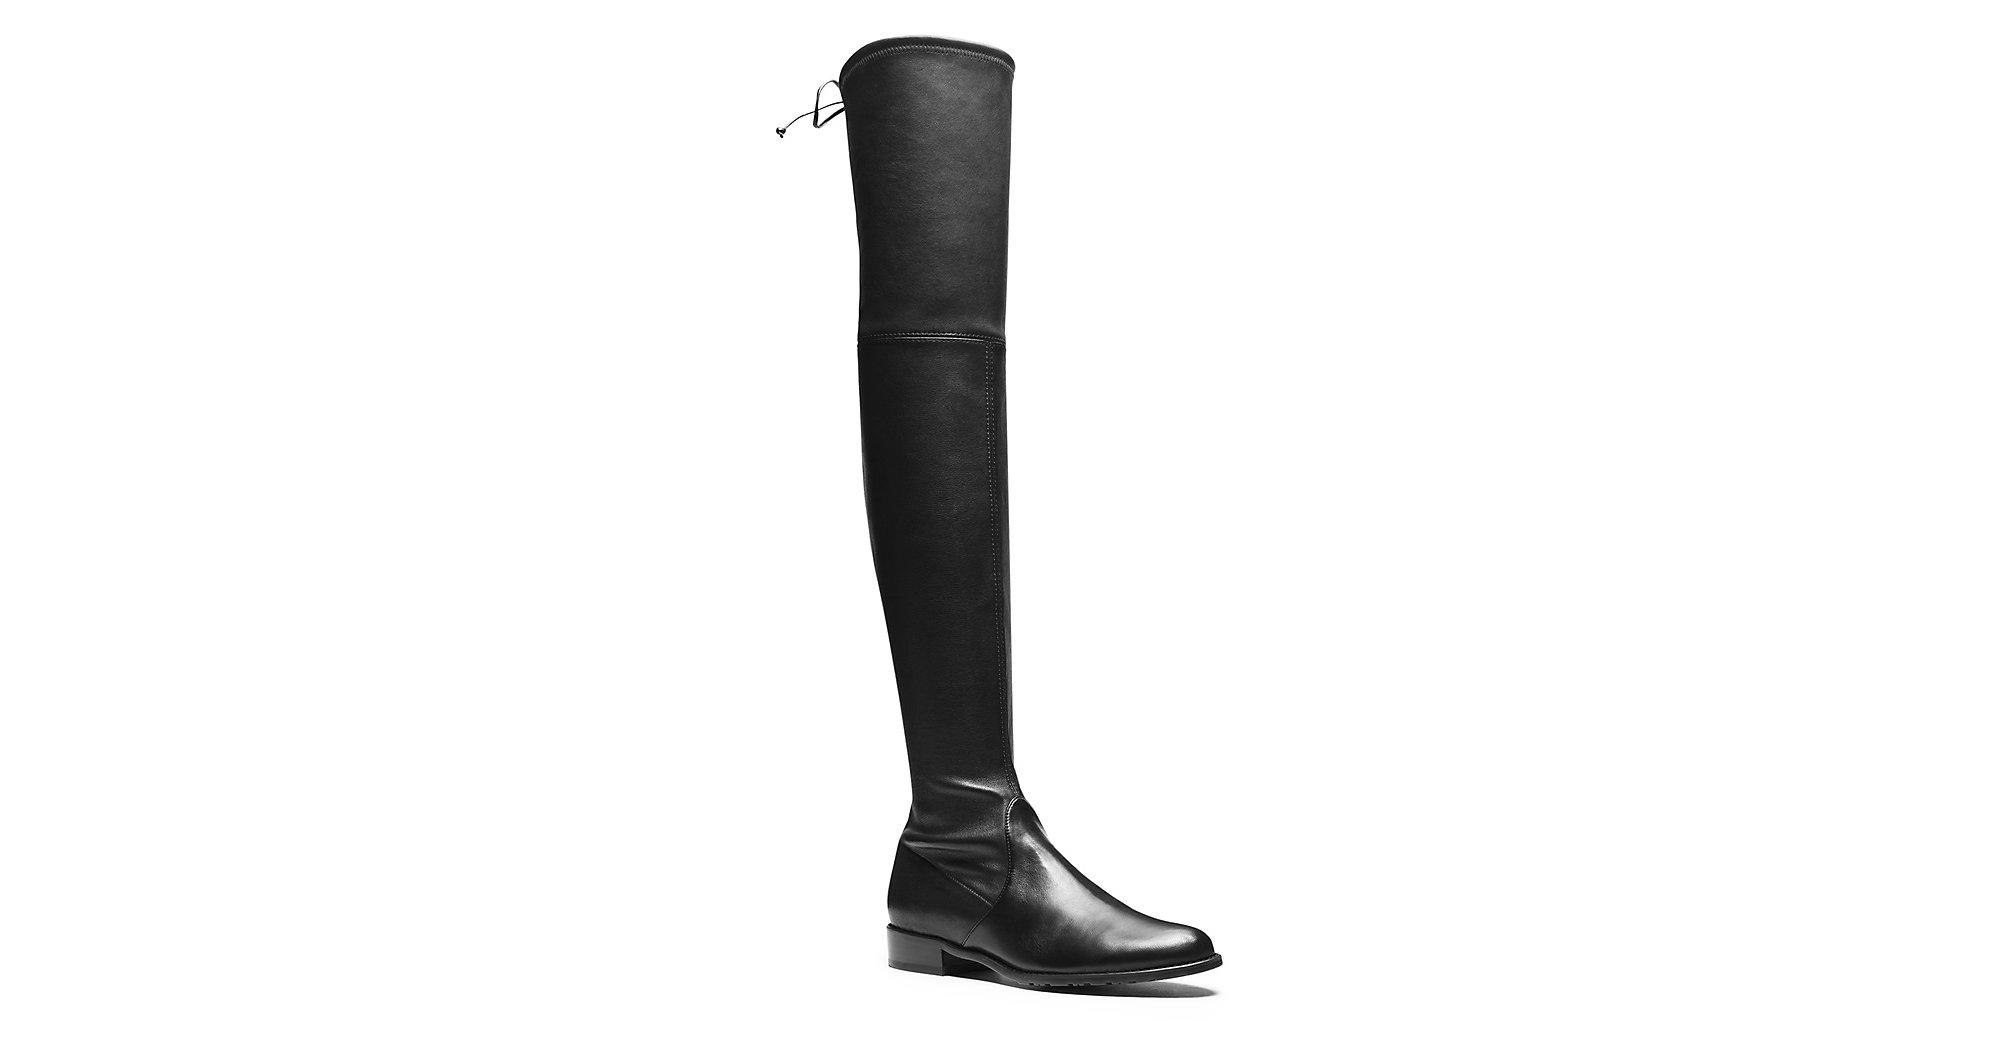 48f5e2f8dfa Gallery. Women s Stuart Weitzman Lowland Women s Metallic Boots ...